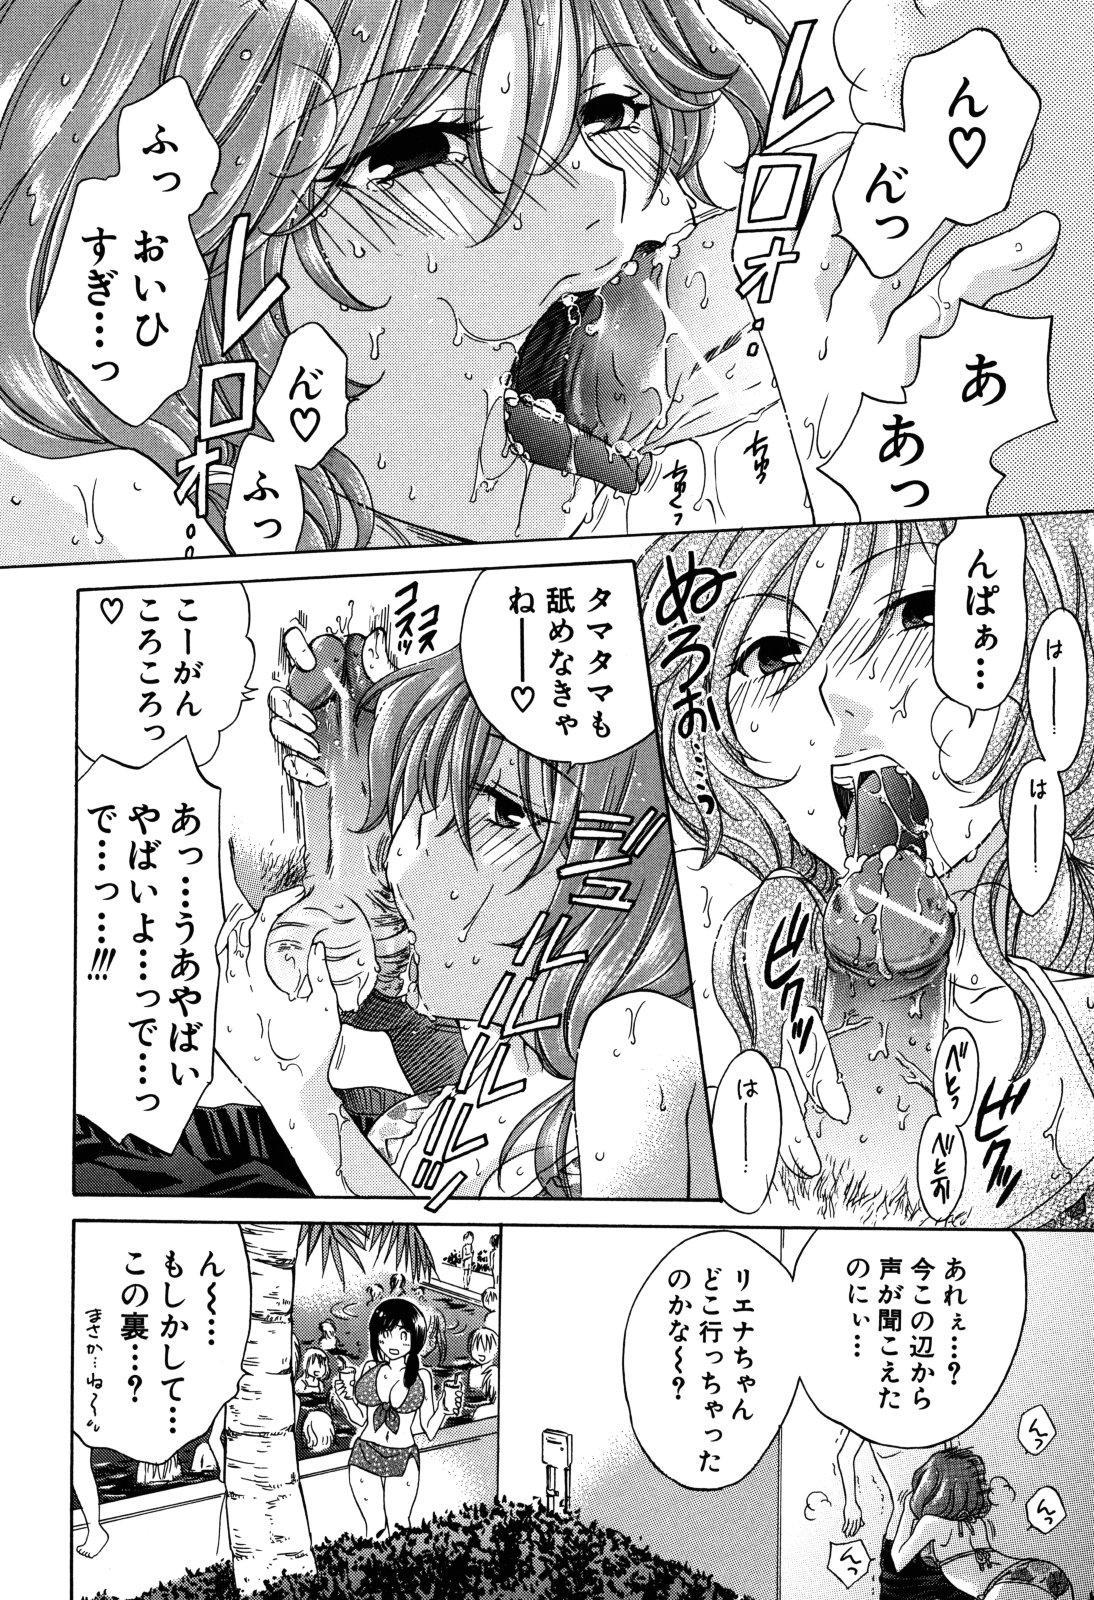 Kanojo ga Ochiru made - She in the depth 59